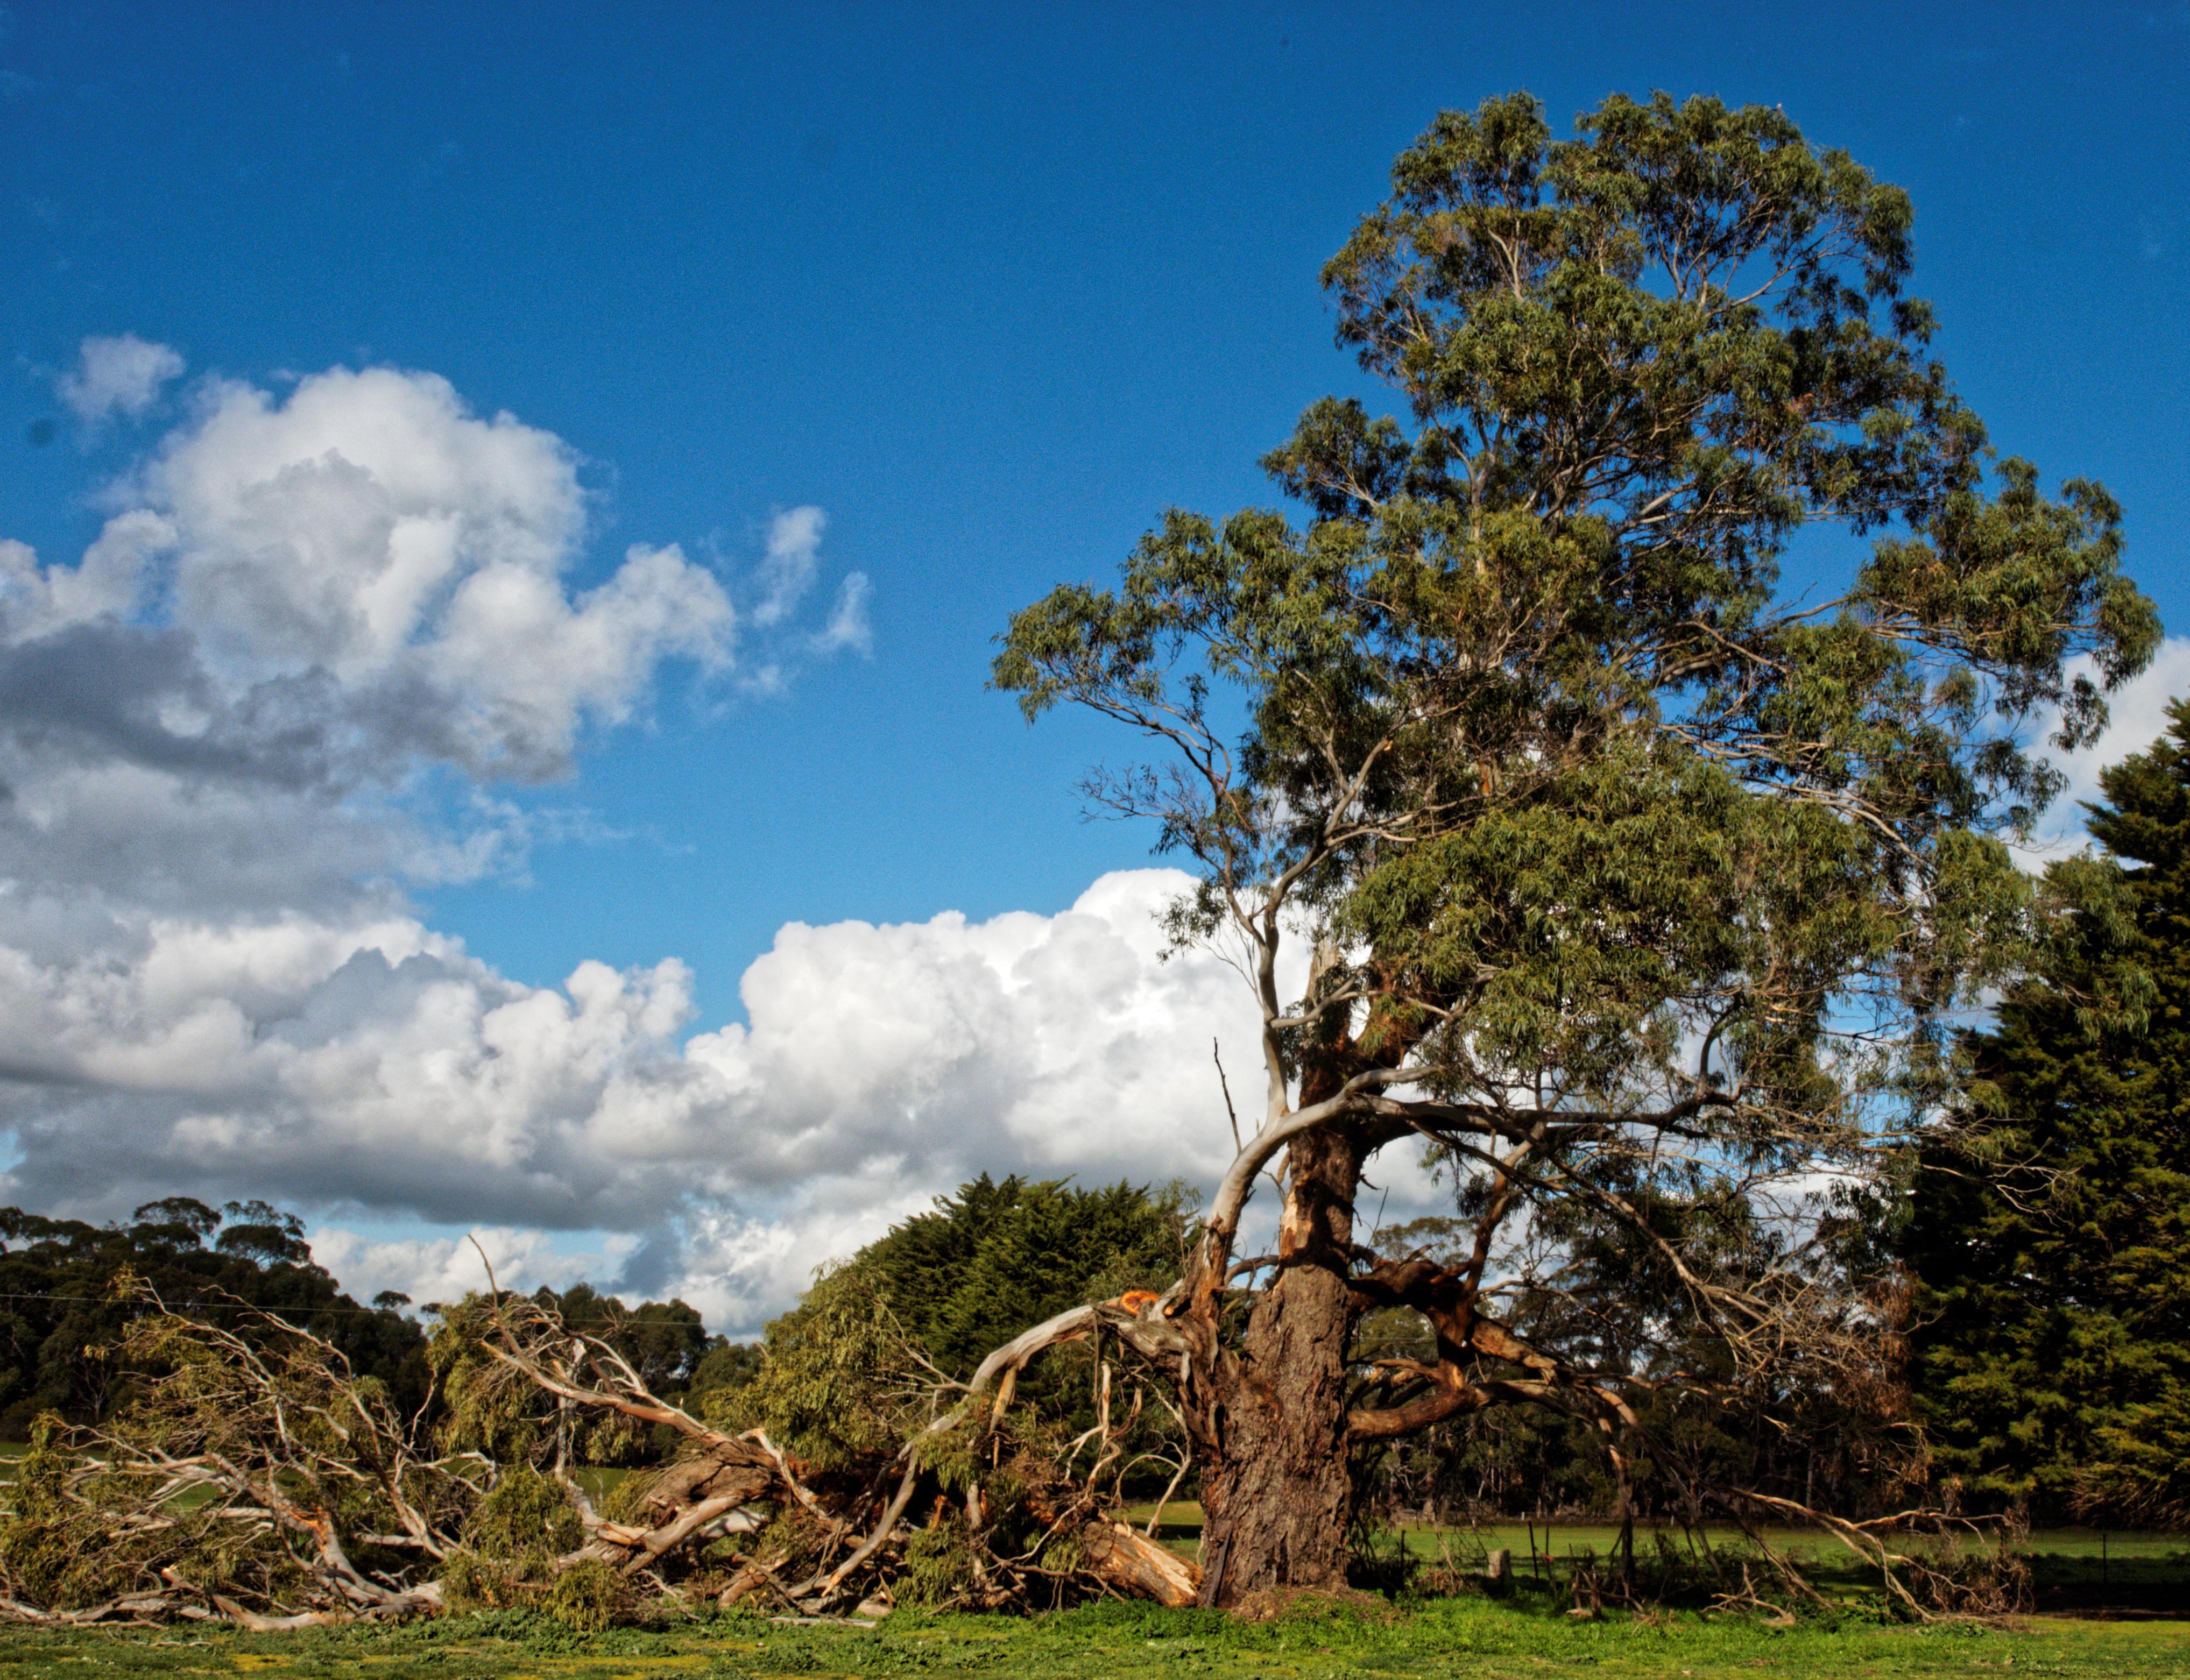 tree-with-broken-branch-4.jpeg